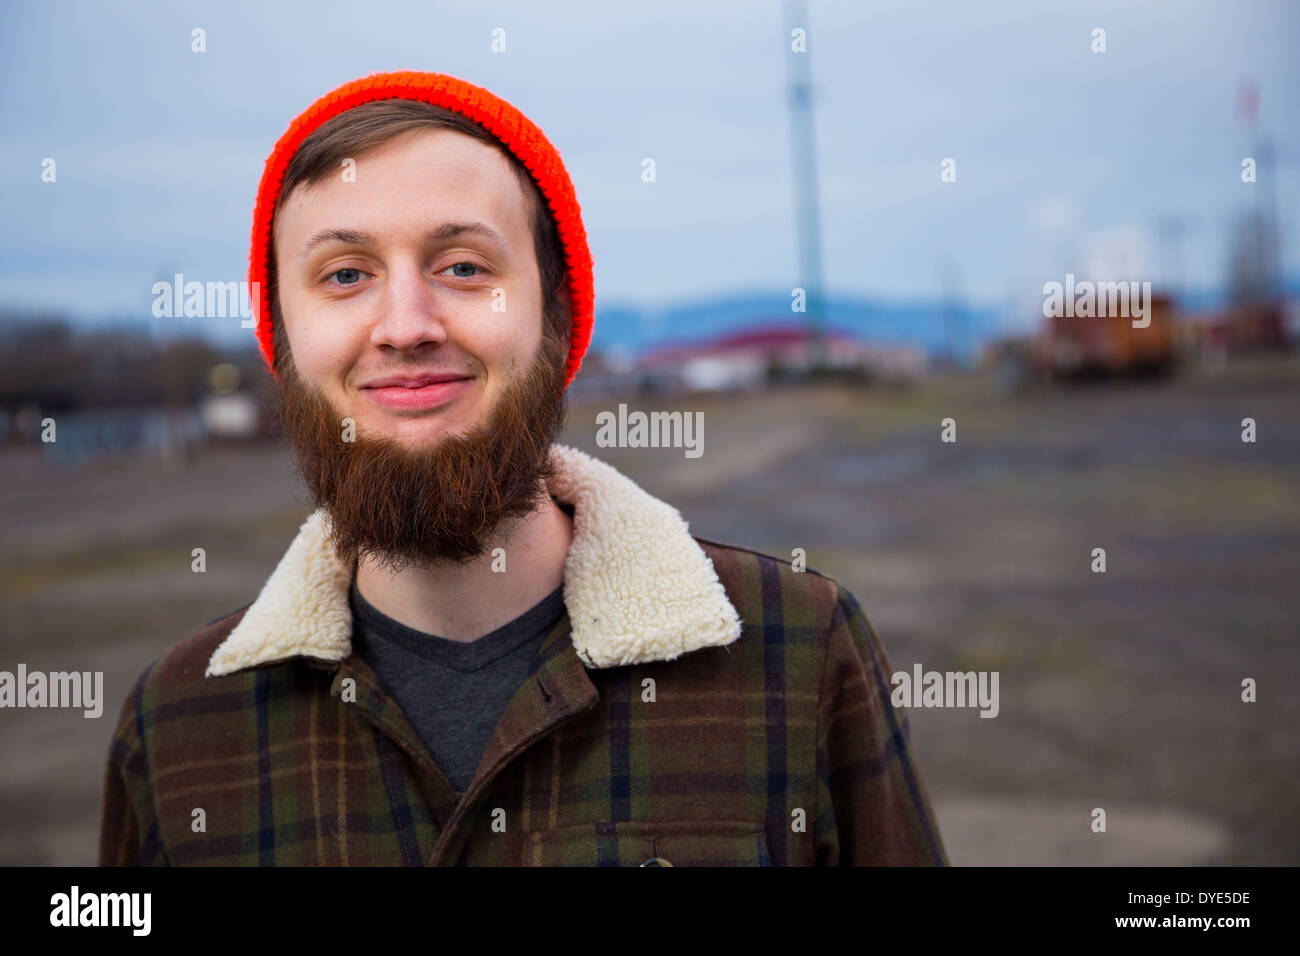 Modernos, hipster Guy en un patio de trenes abandonados al atardecer en este retrato de estilo de moda. Imagen De Stock